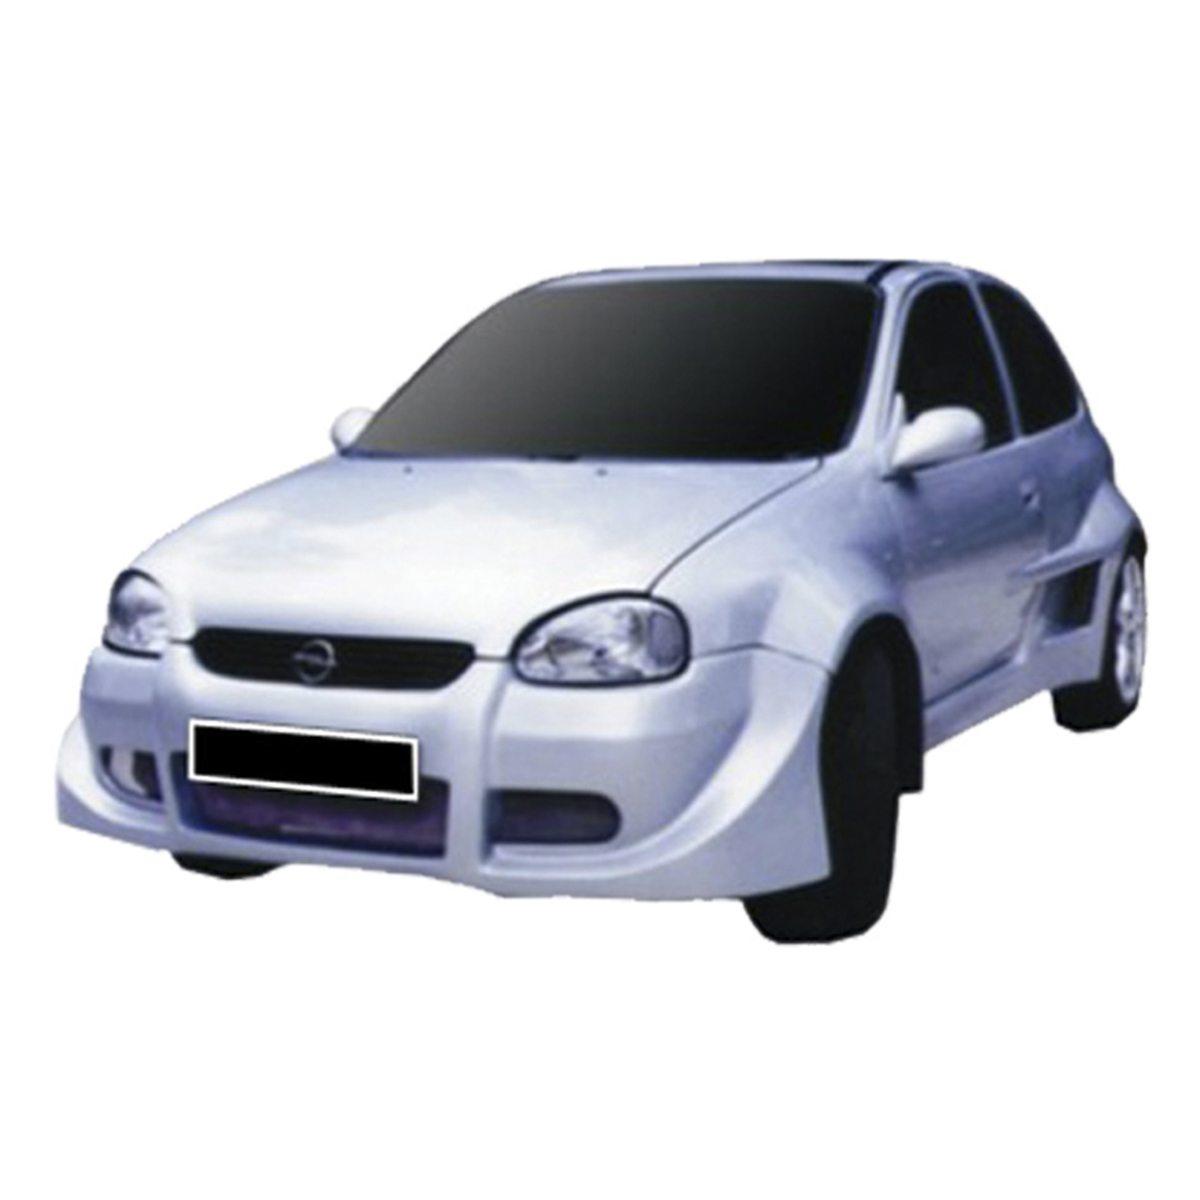 Opel-Corsa-B-Prowler-Wide-Frt-PCA232